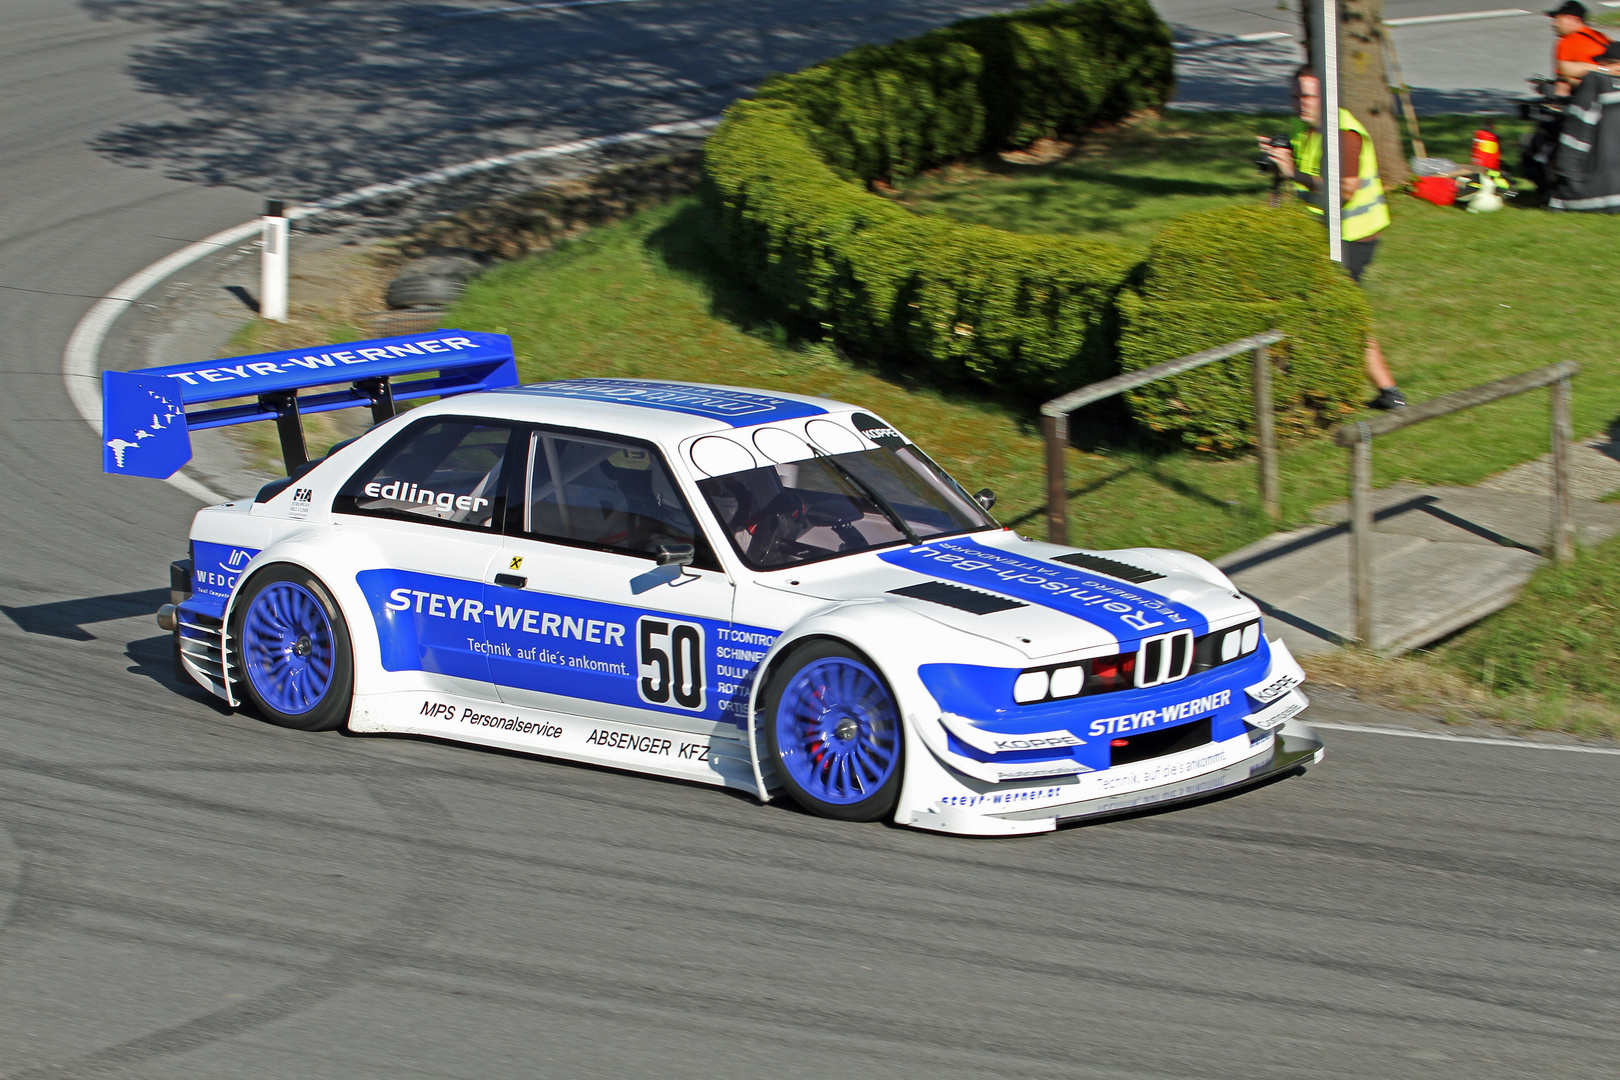 BMW 320 IRL evo